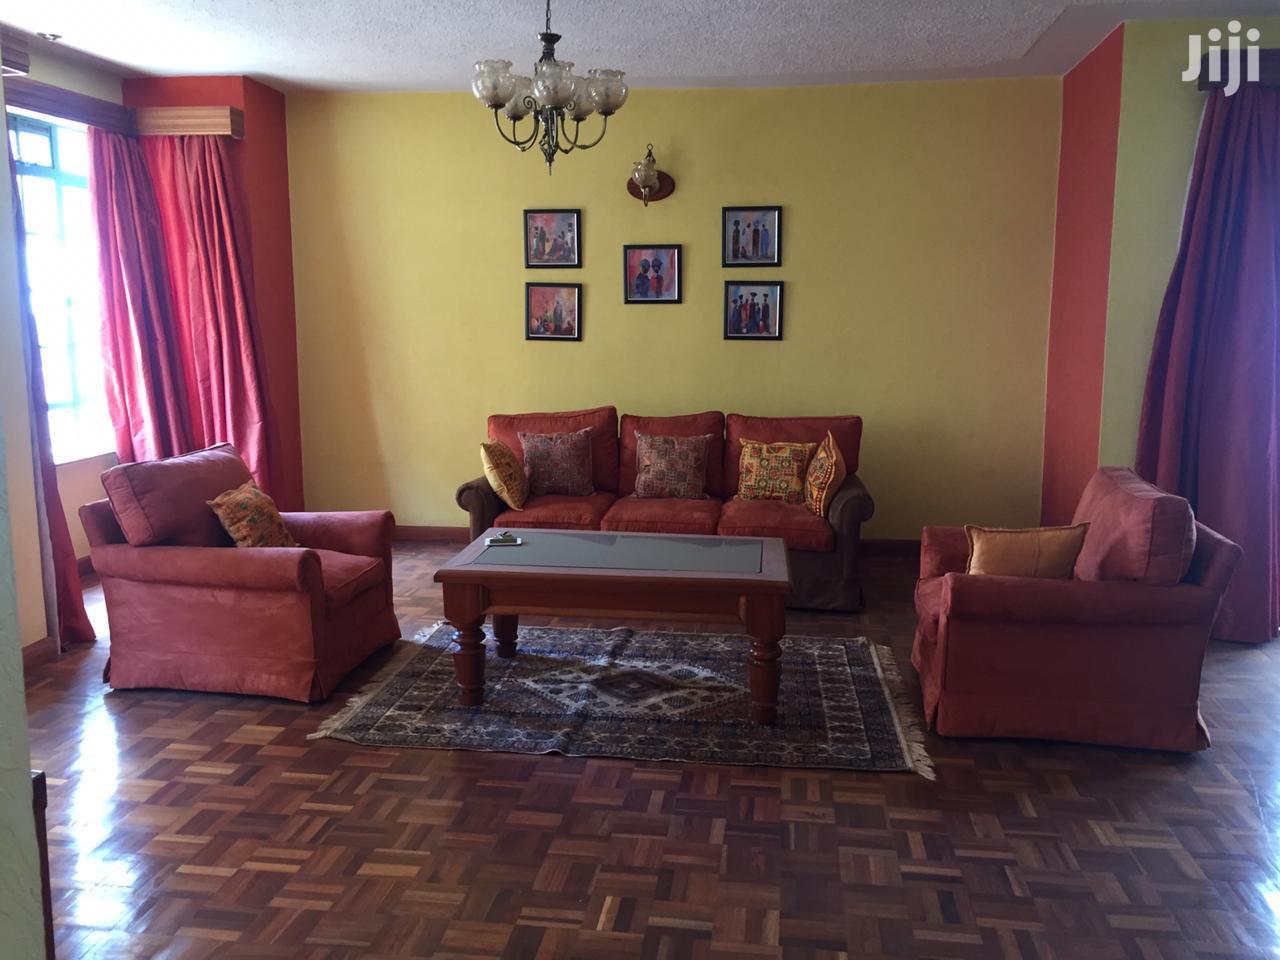 3 Bedroom Fully Furnished In Lavington